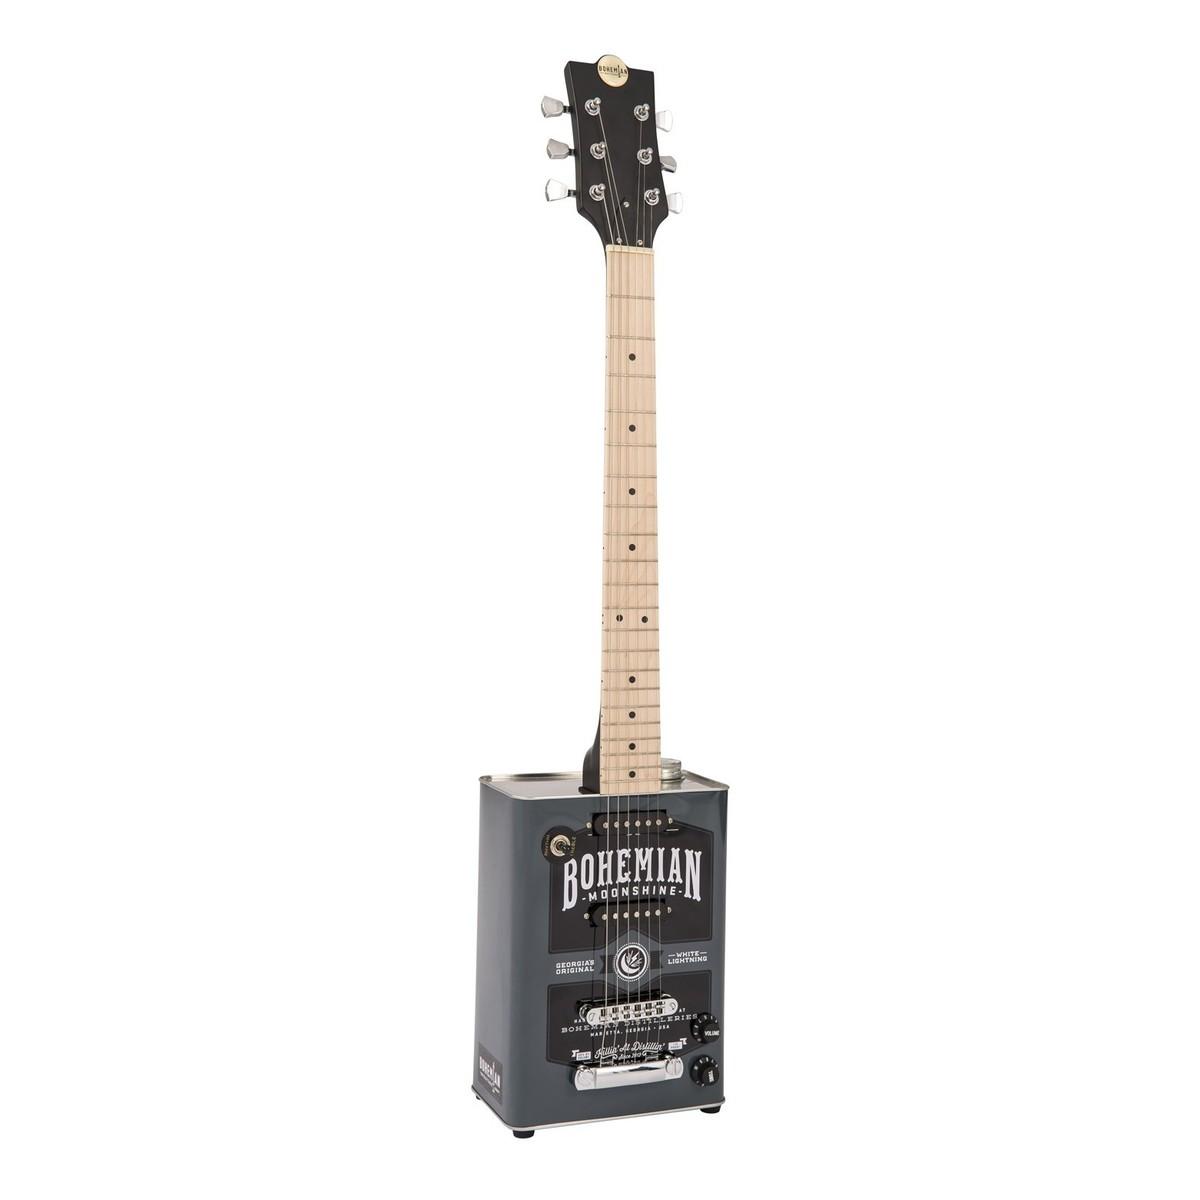 bohemian boho electric guitar moon shine b stock at gear4music. Black Bedroom Furniture Sets. Home Design Ideas